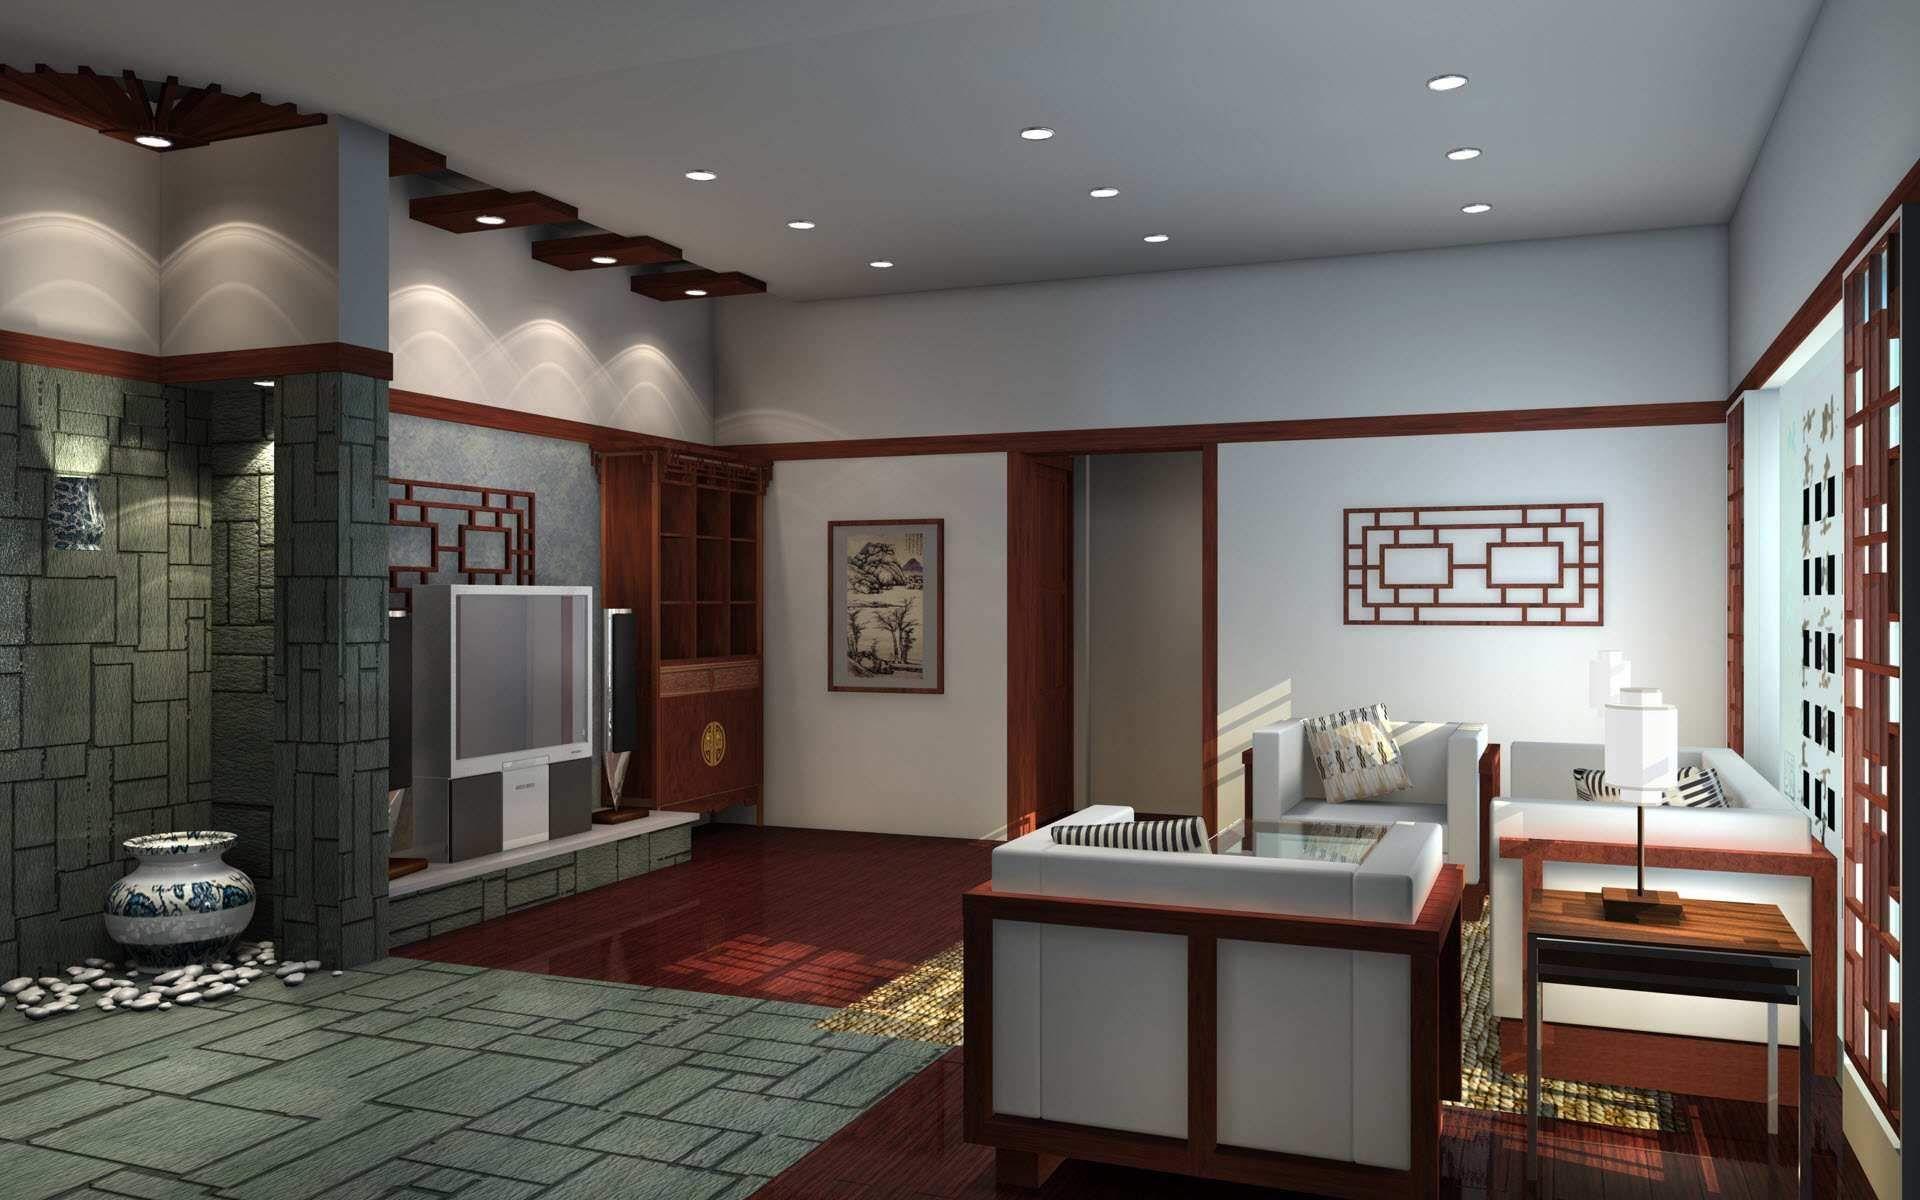 New modern living room design home interior interior design for small living room in mumbai